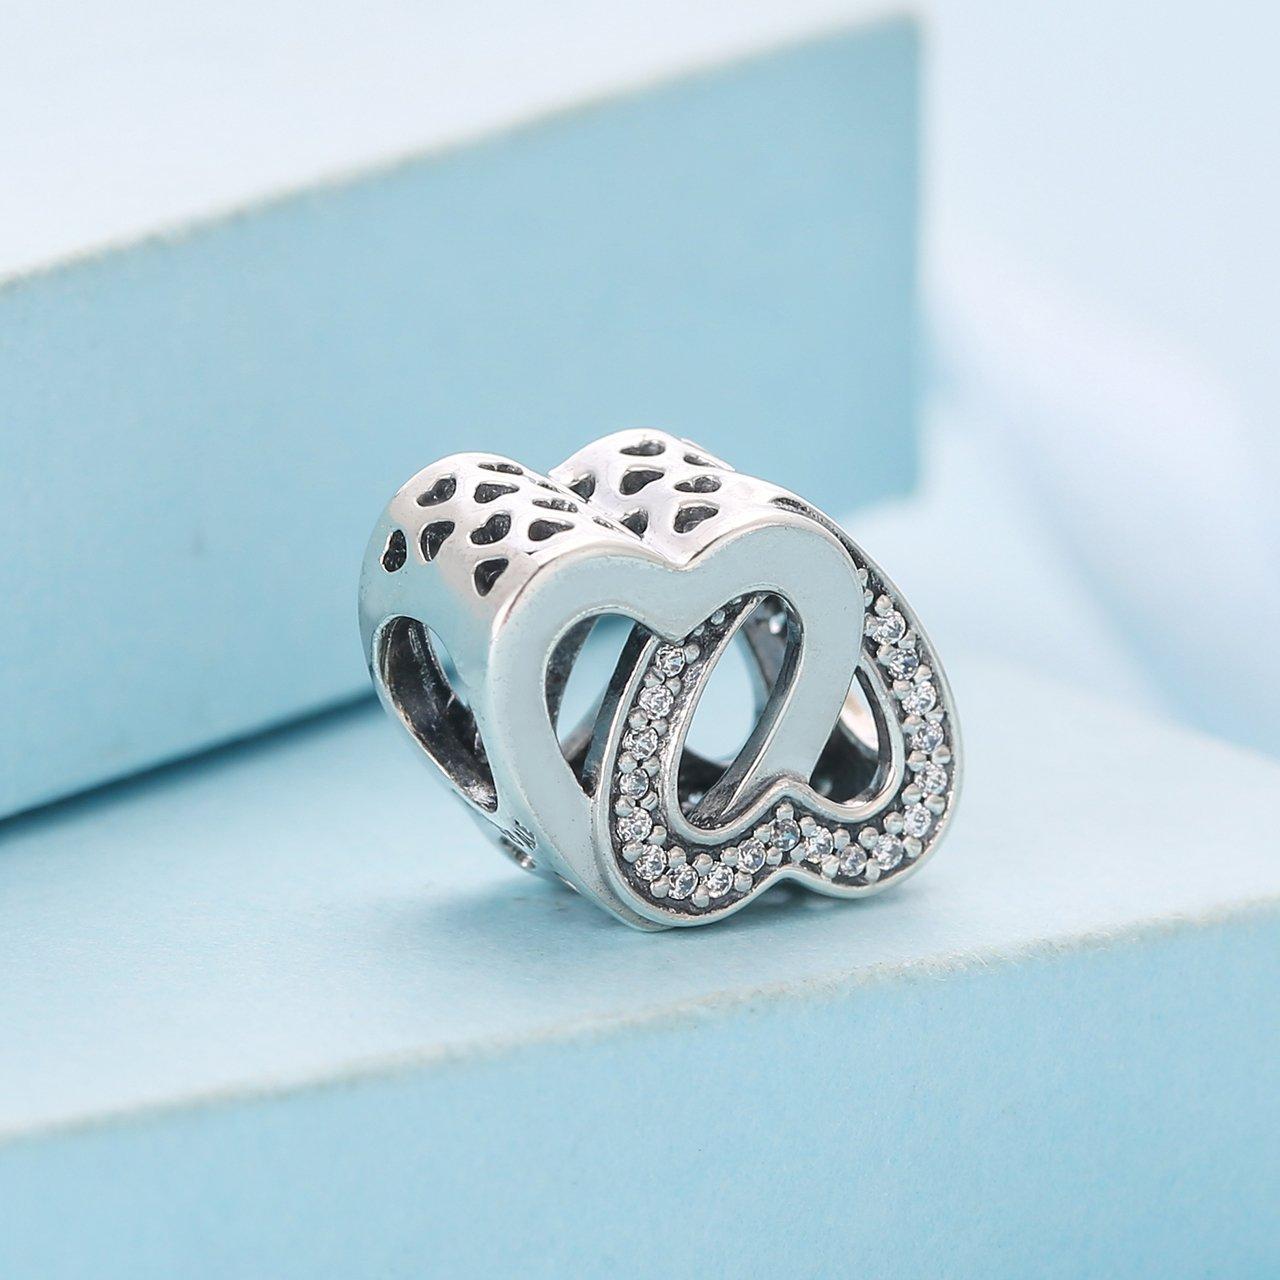 1f5a3861c Amazon.com: PANDORA Entwined Love Charm 791880CZ: Jewelry